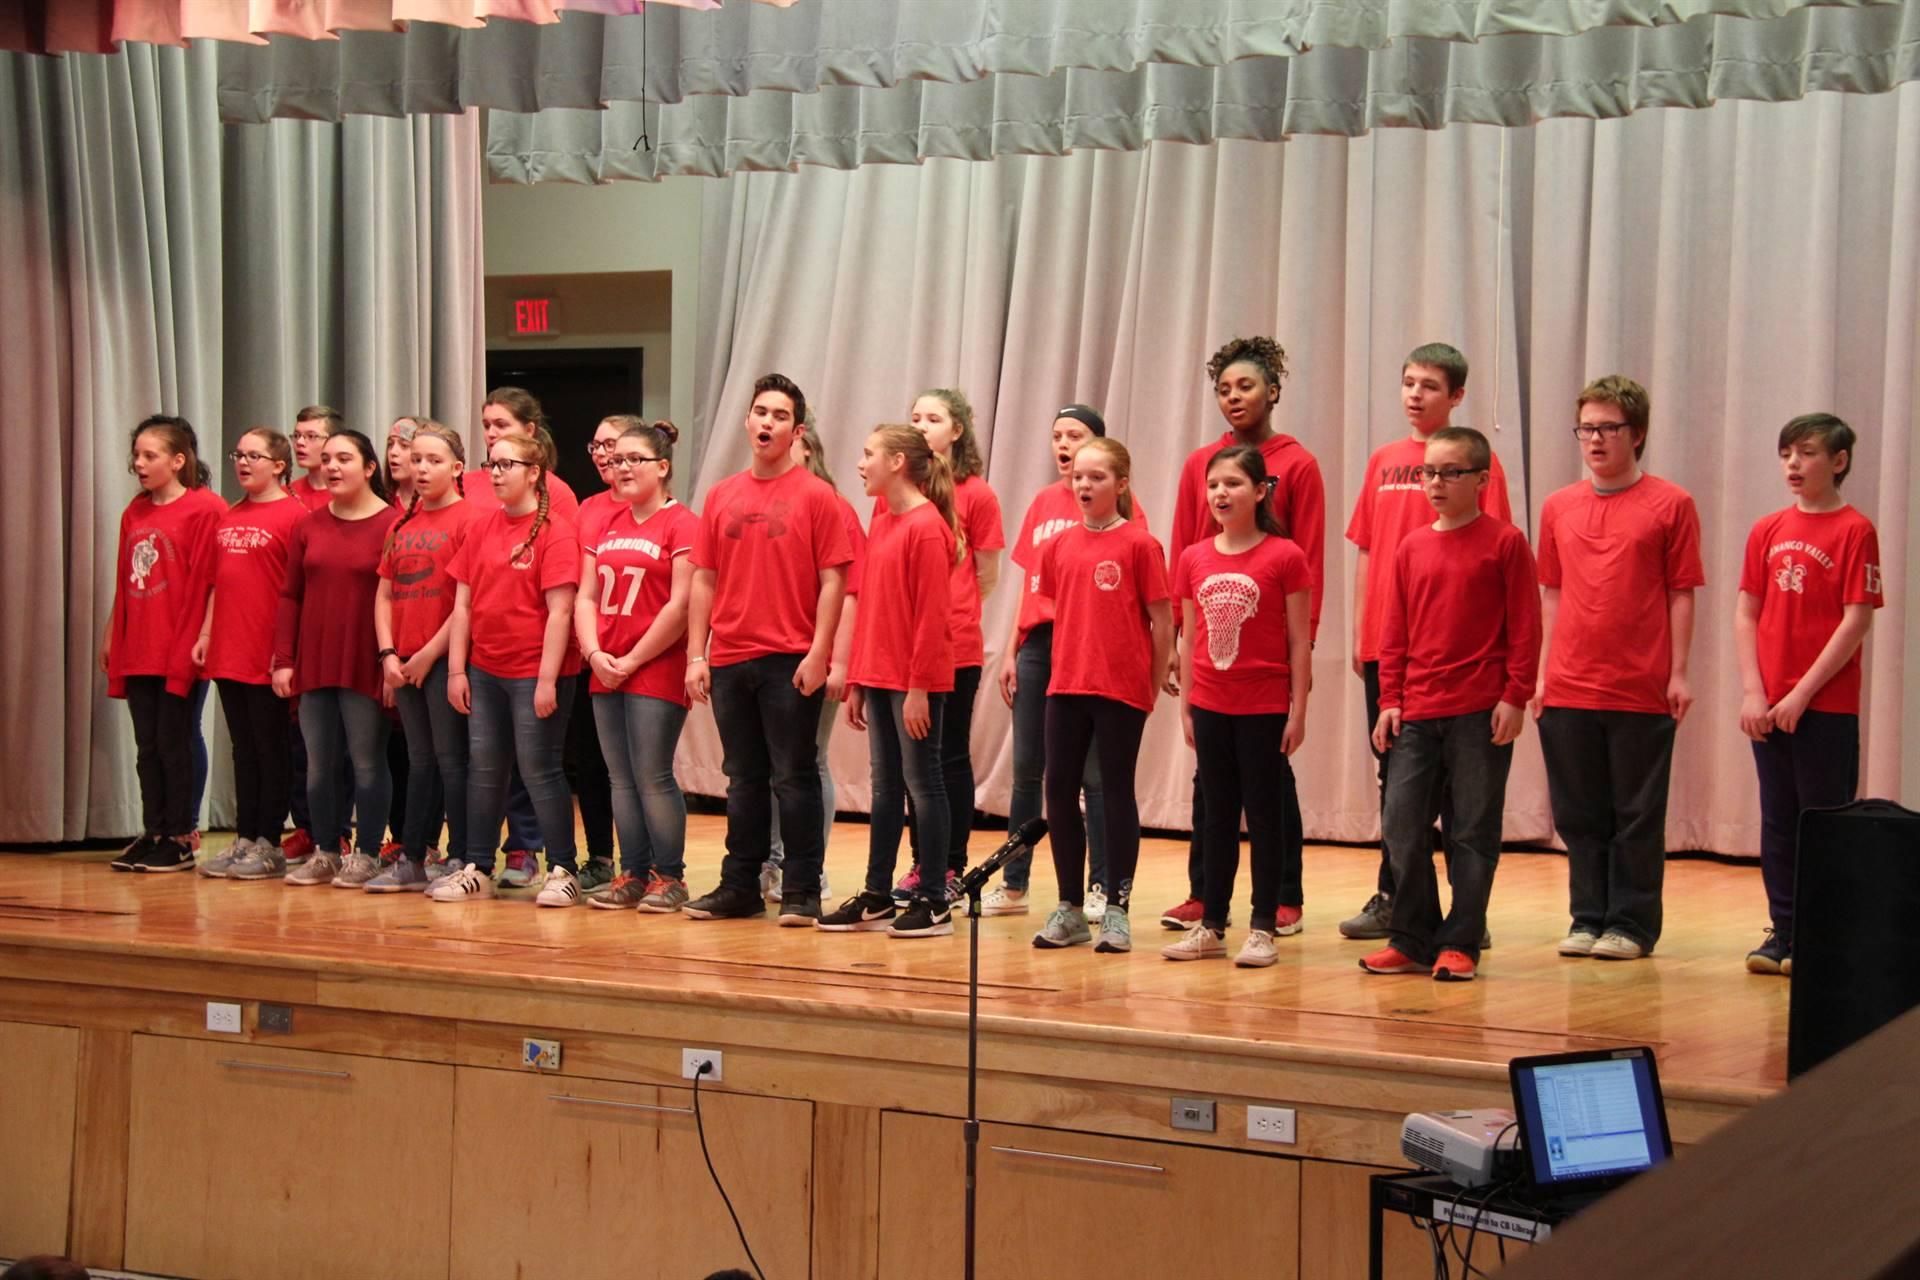 sneak preview performance at chenango bridge elementary 10